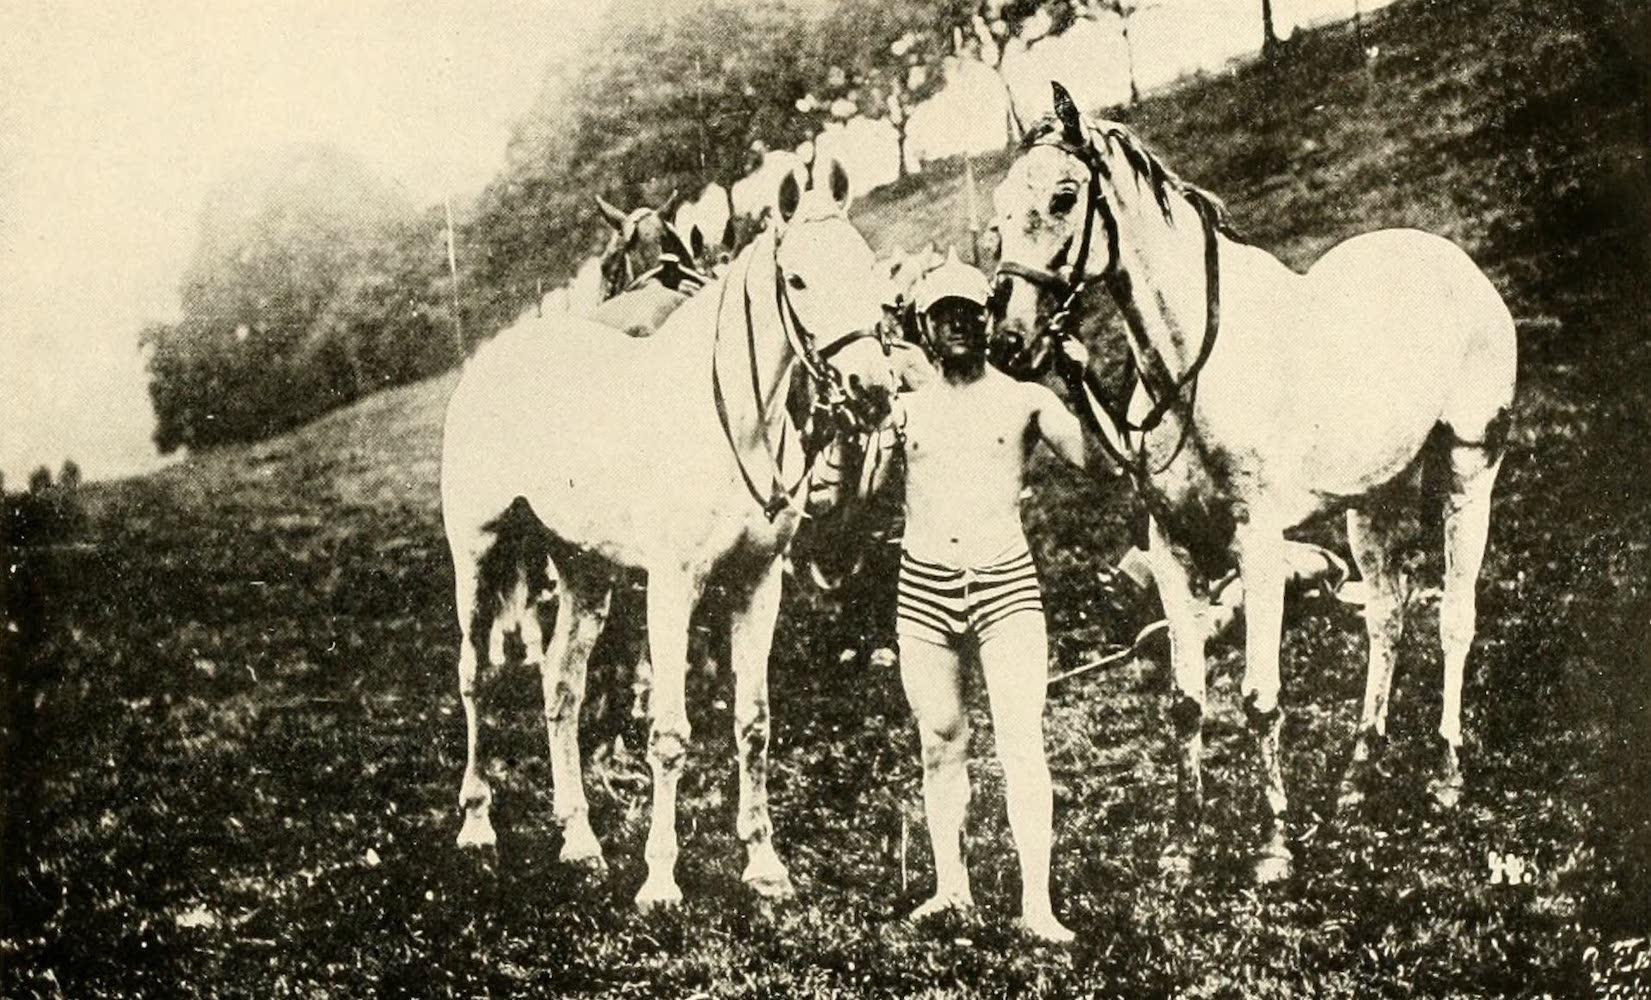 Laird & Lee's World's War Glimpses - German Army Maneuvers (1914)